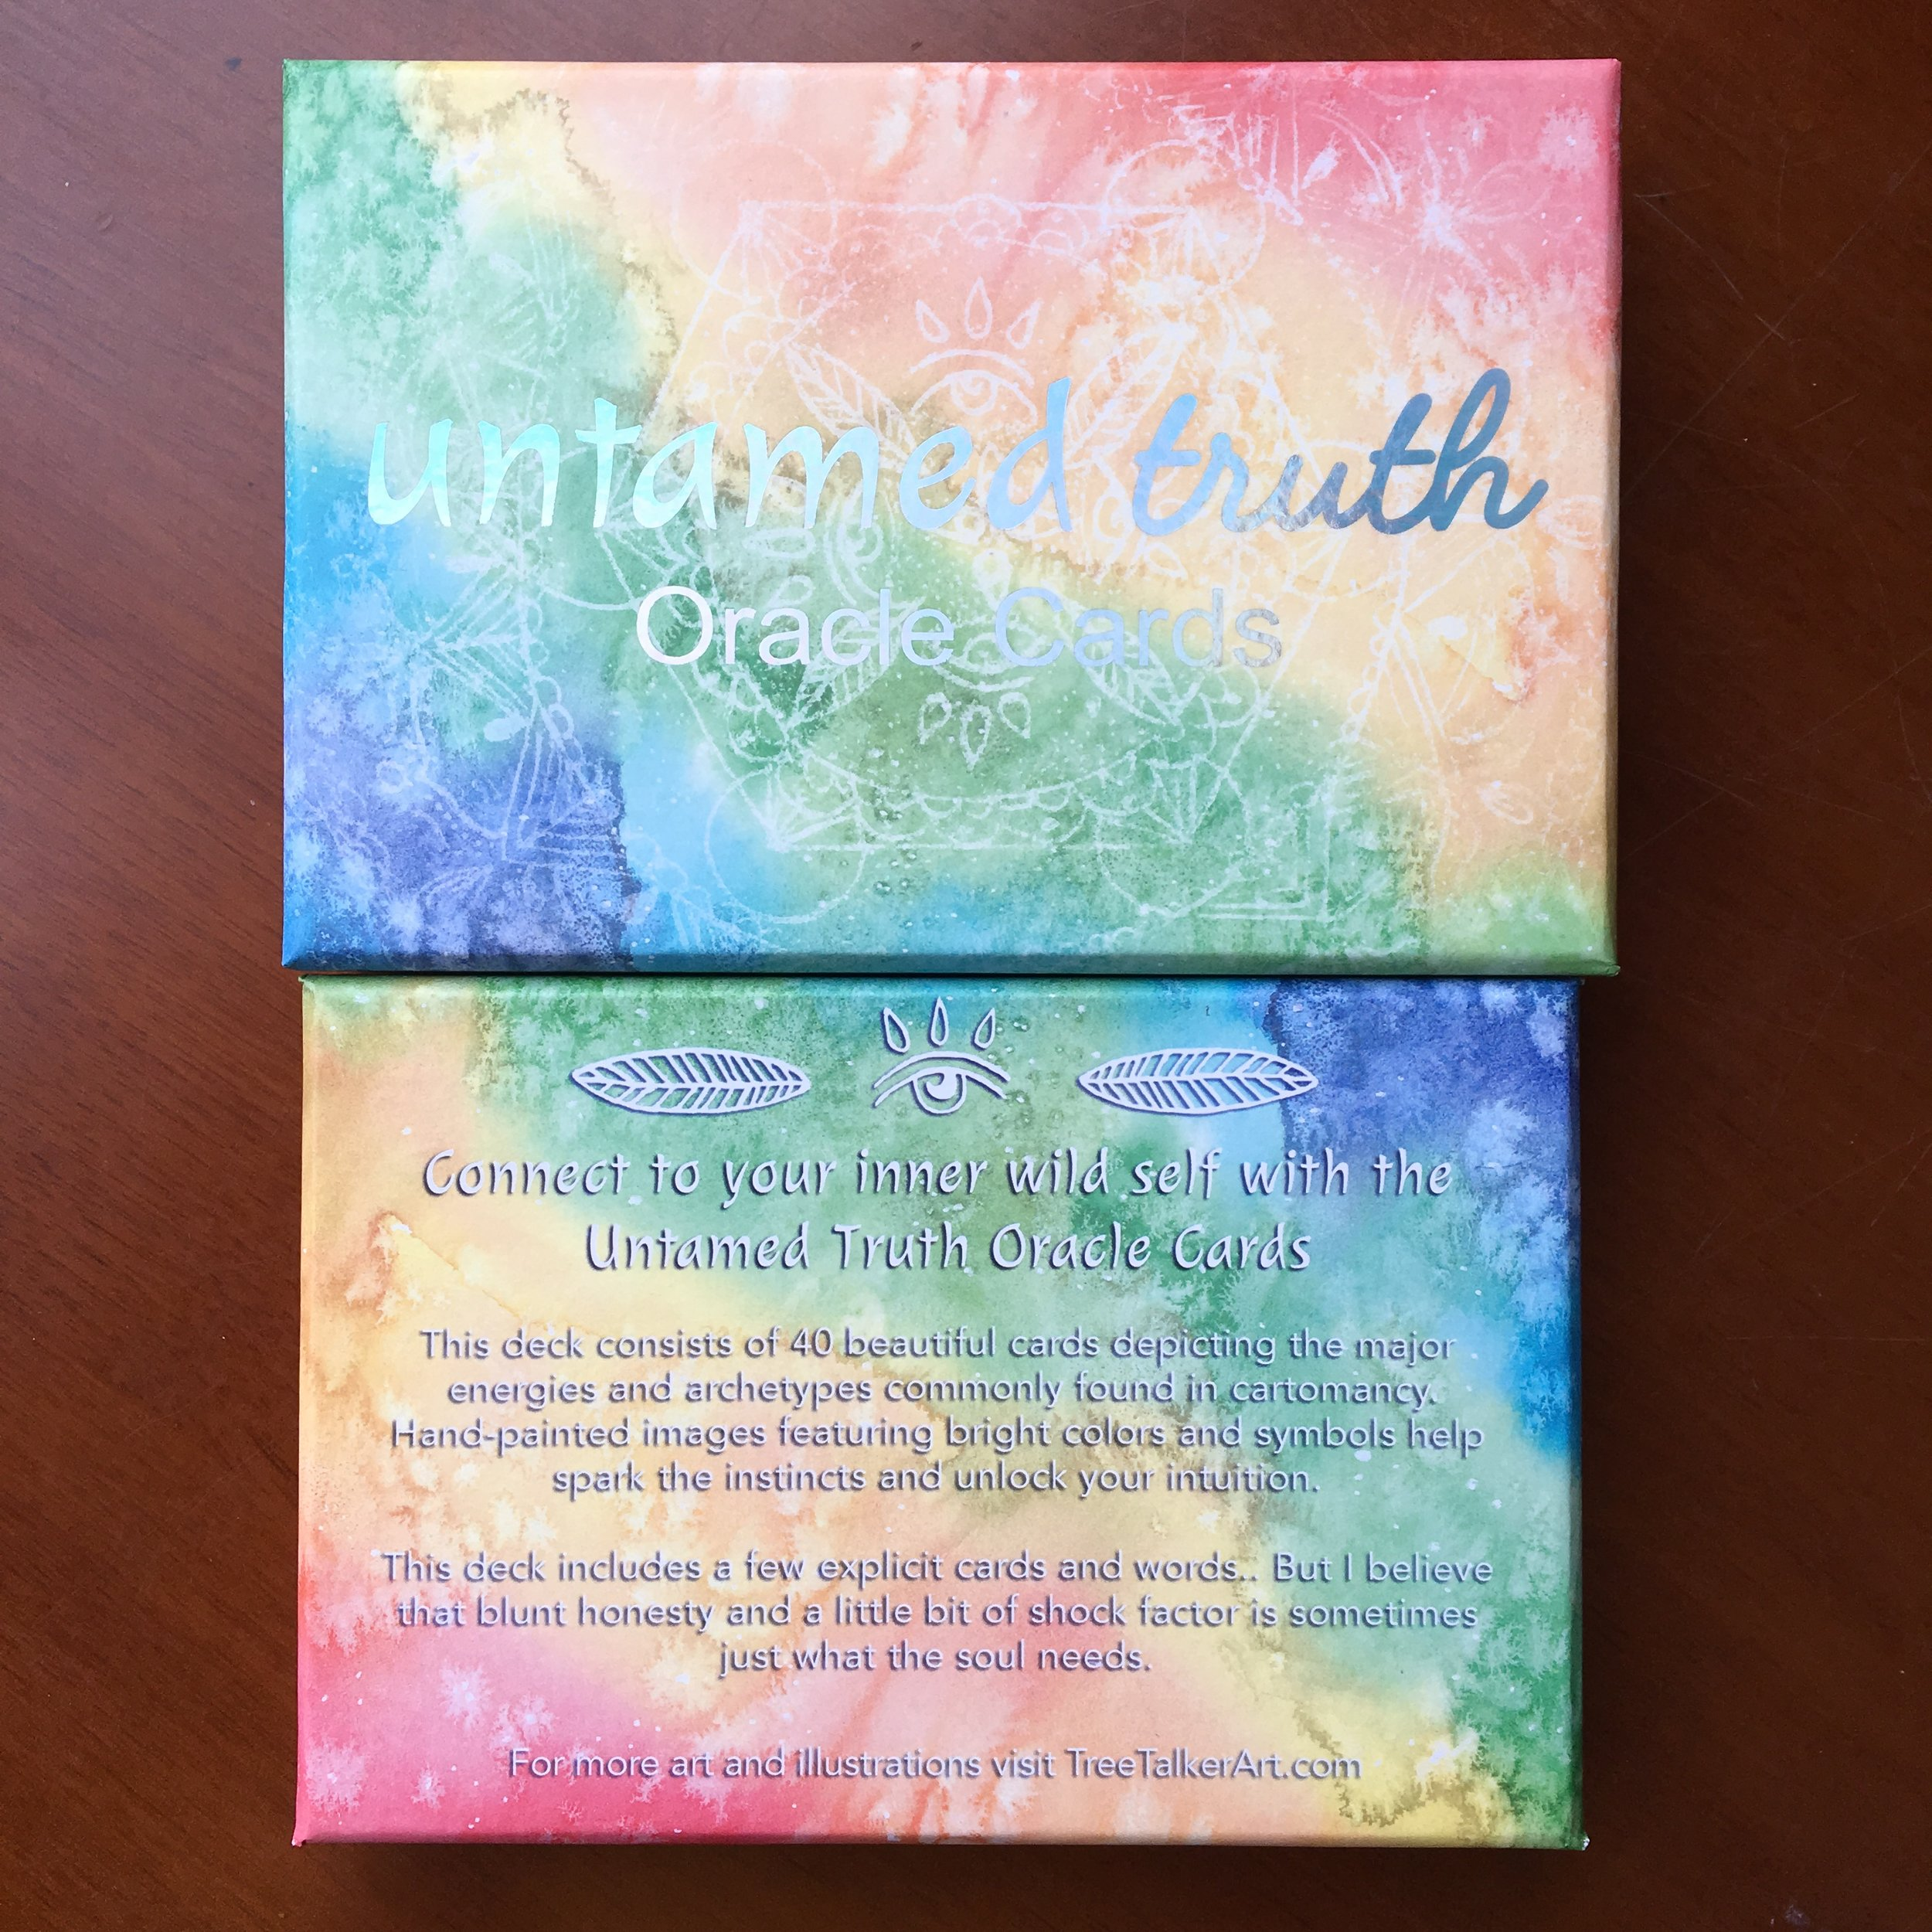 Untamed Truth Oracle Box | Tree Talker Art